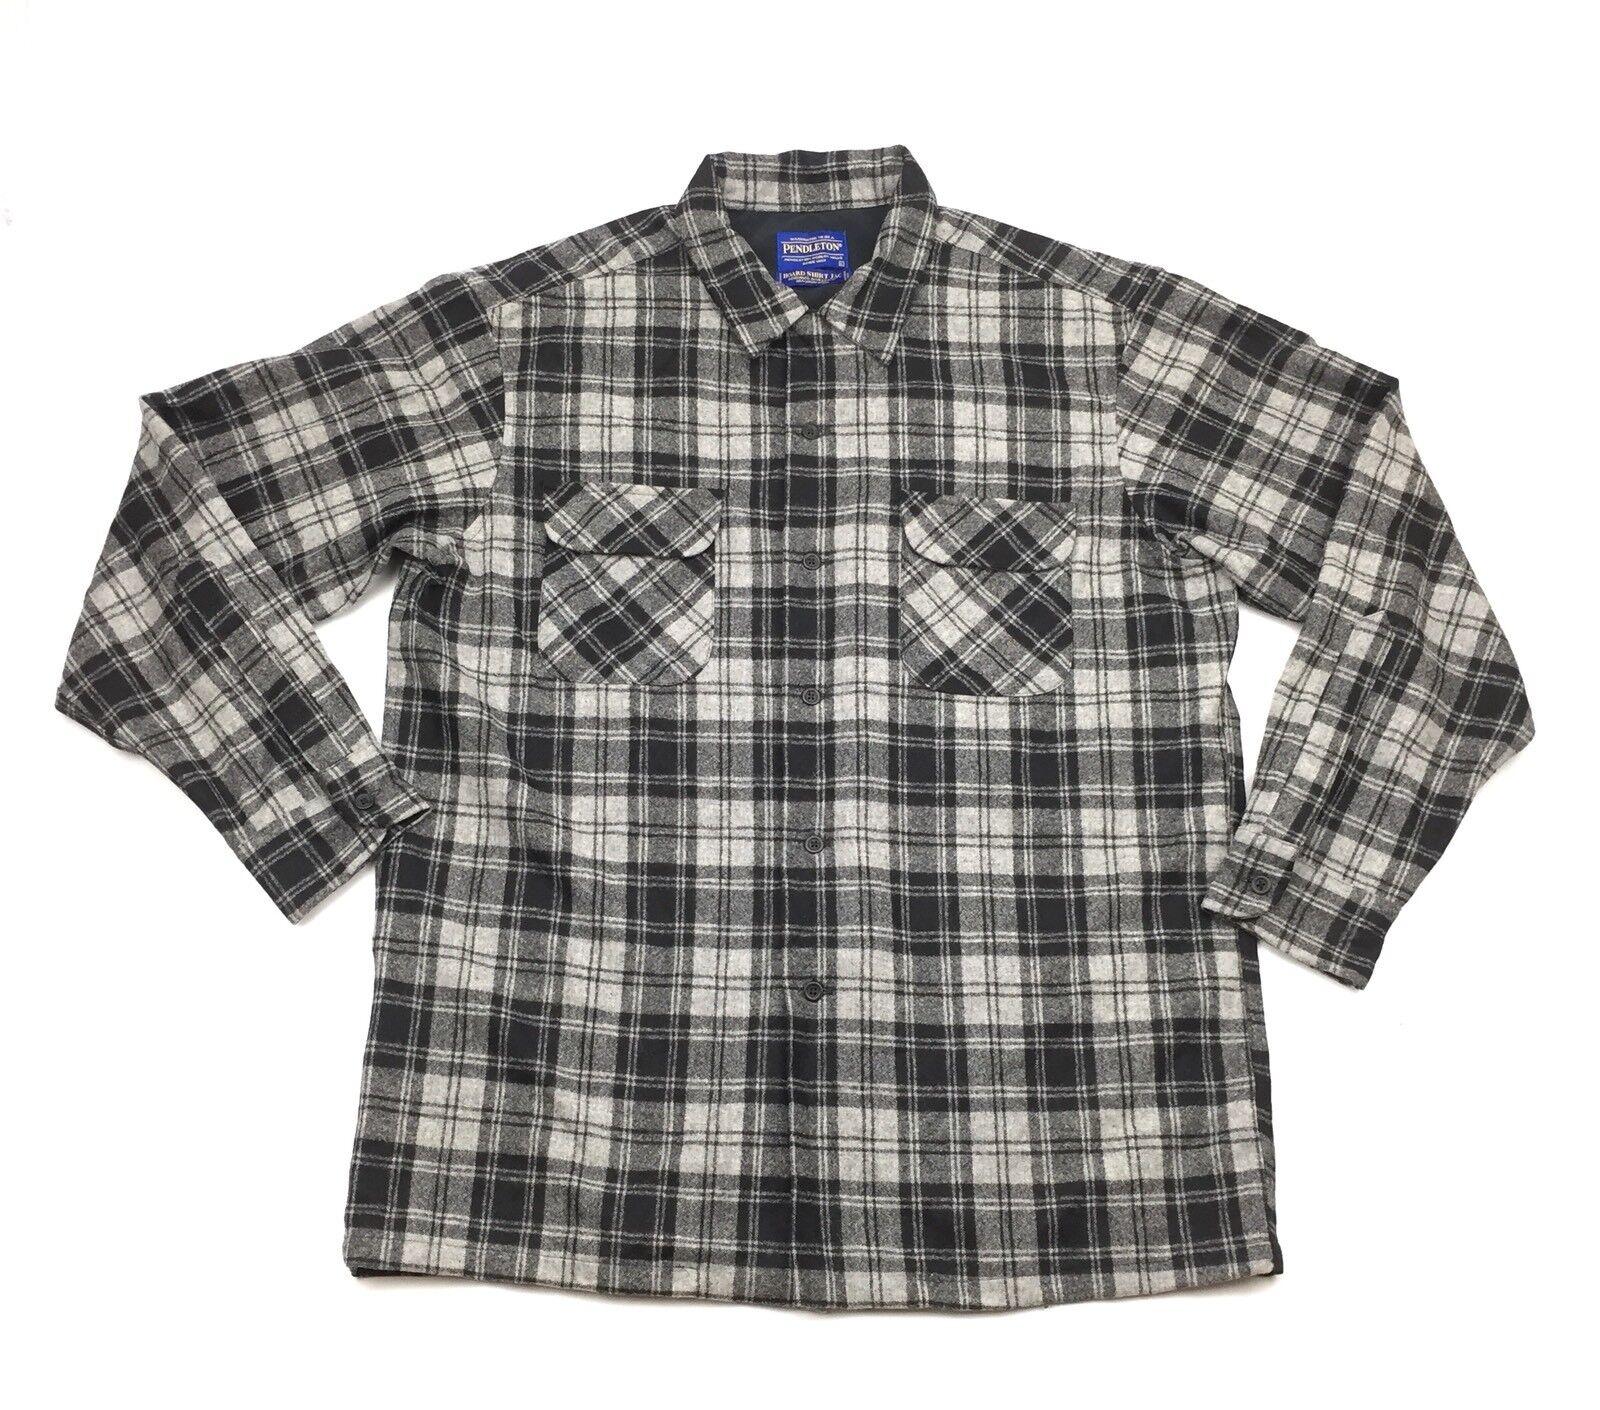 Pendleton Board Shirt Jac Mens Plaid Loop Collar Flannel Long Sleeve Shirt